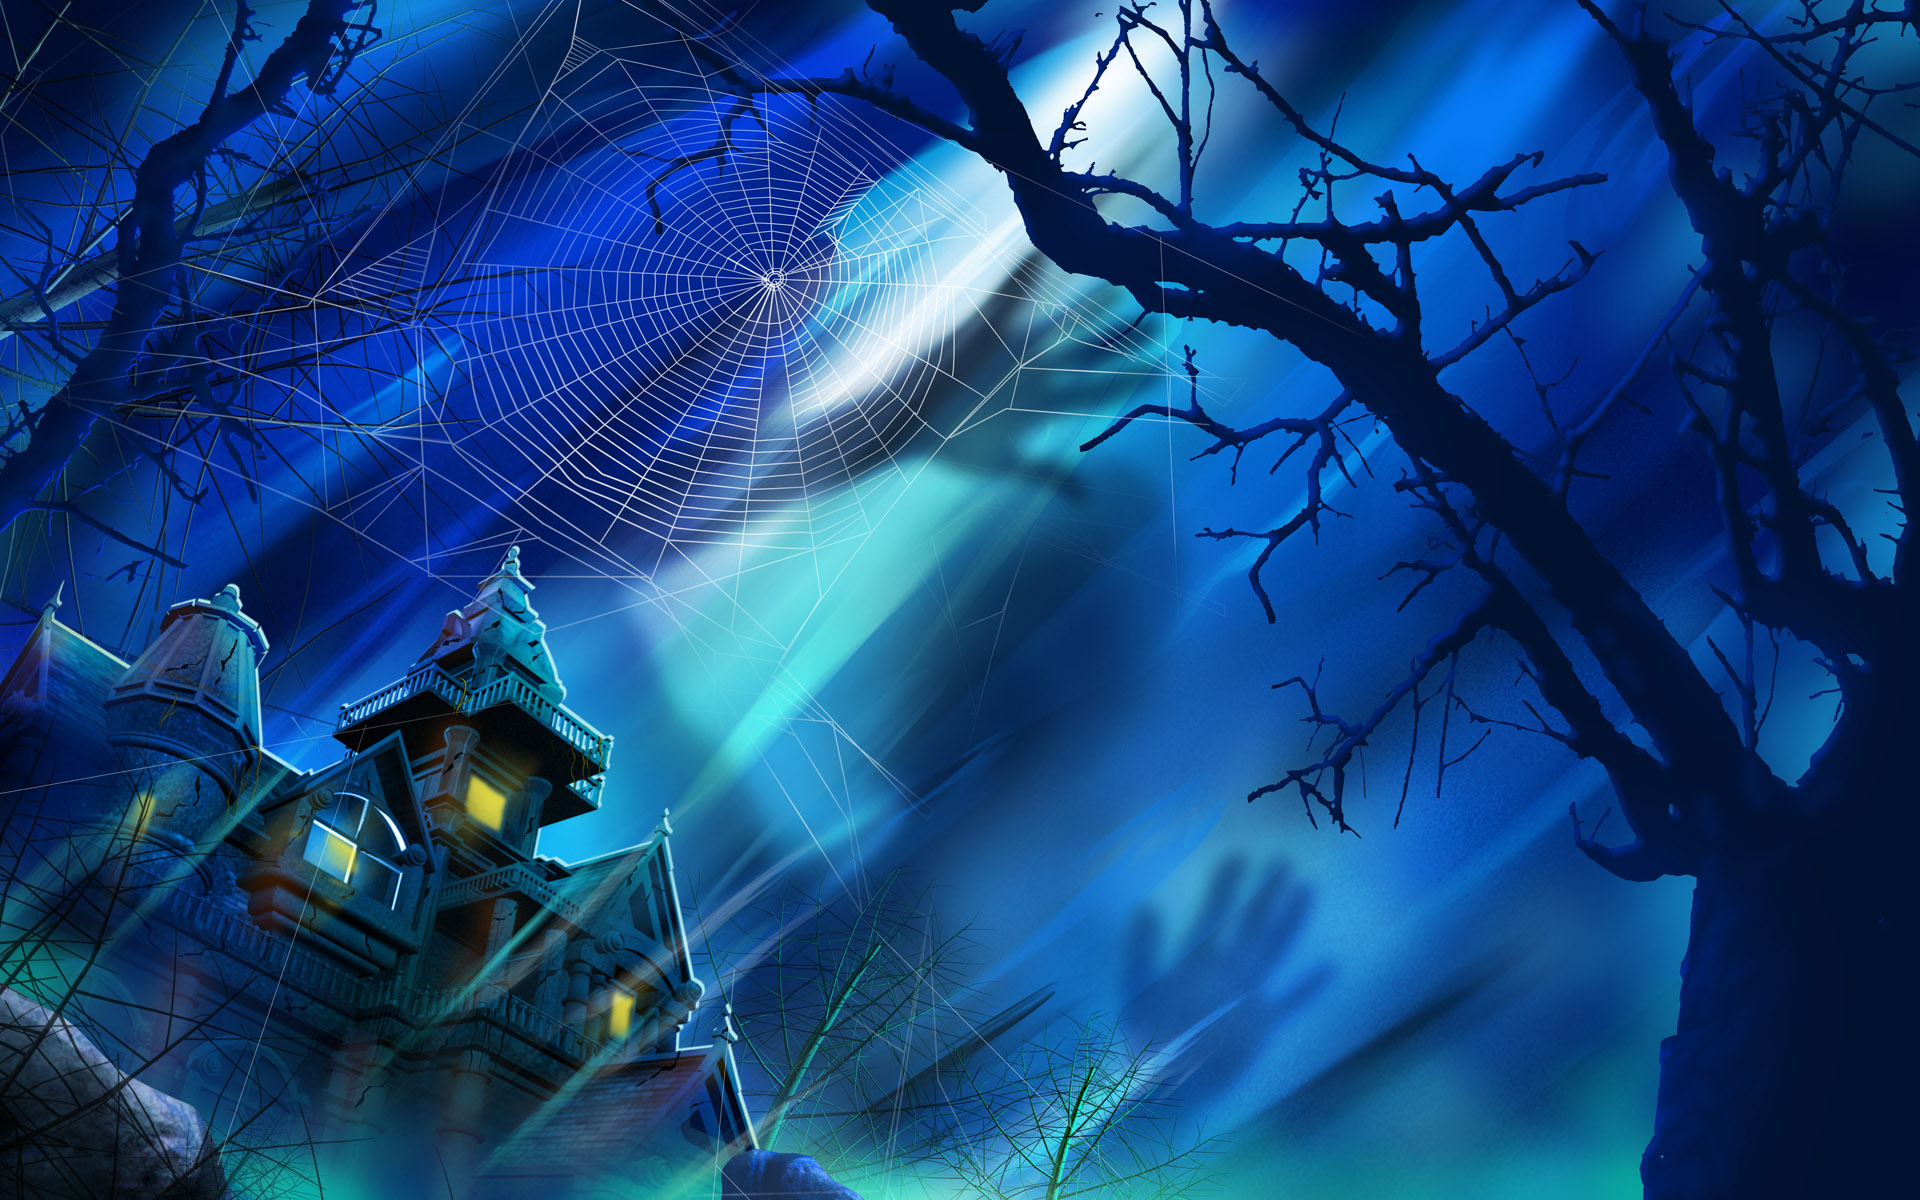 Halloween Night Desktop Wallpapers FREE on Latorocom 1920x1200